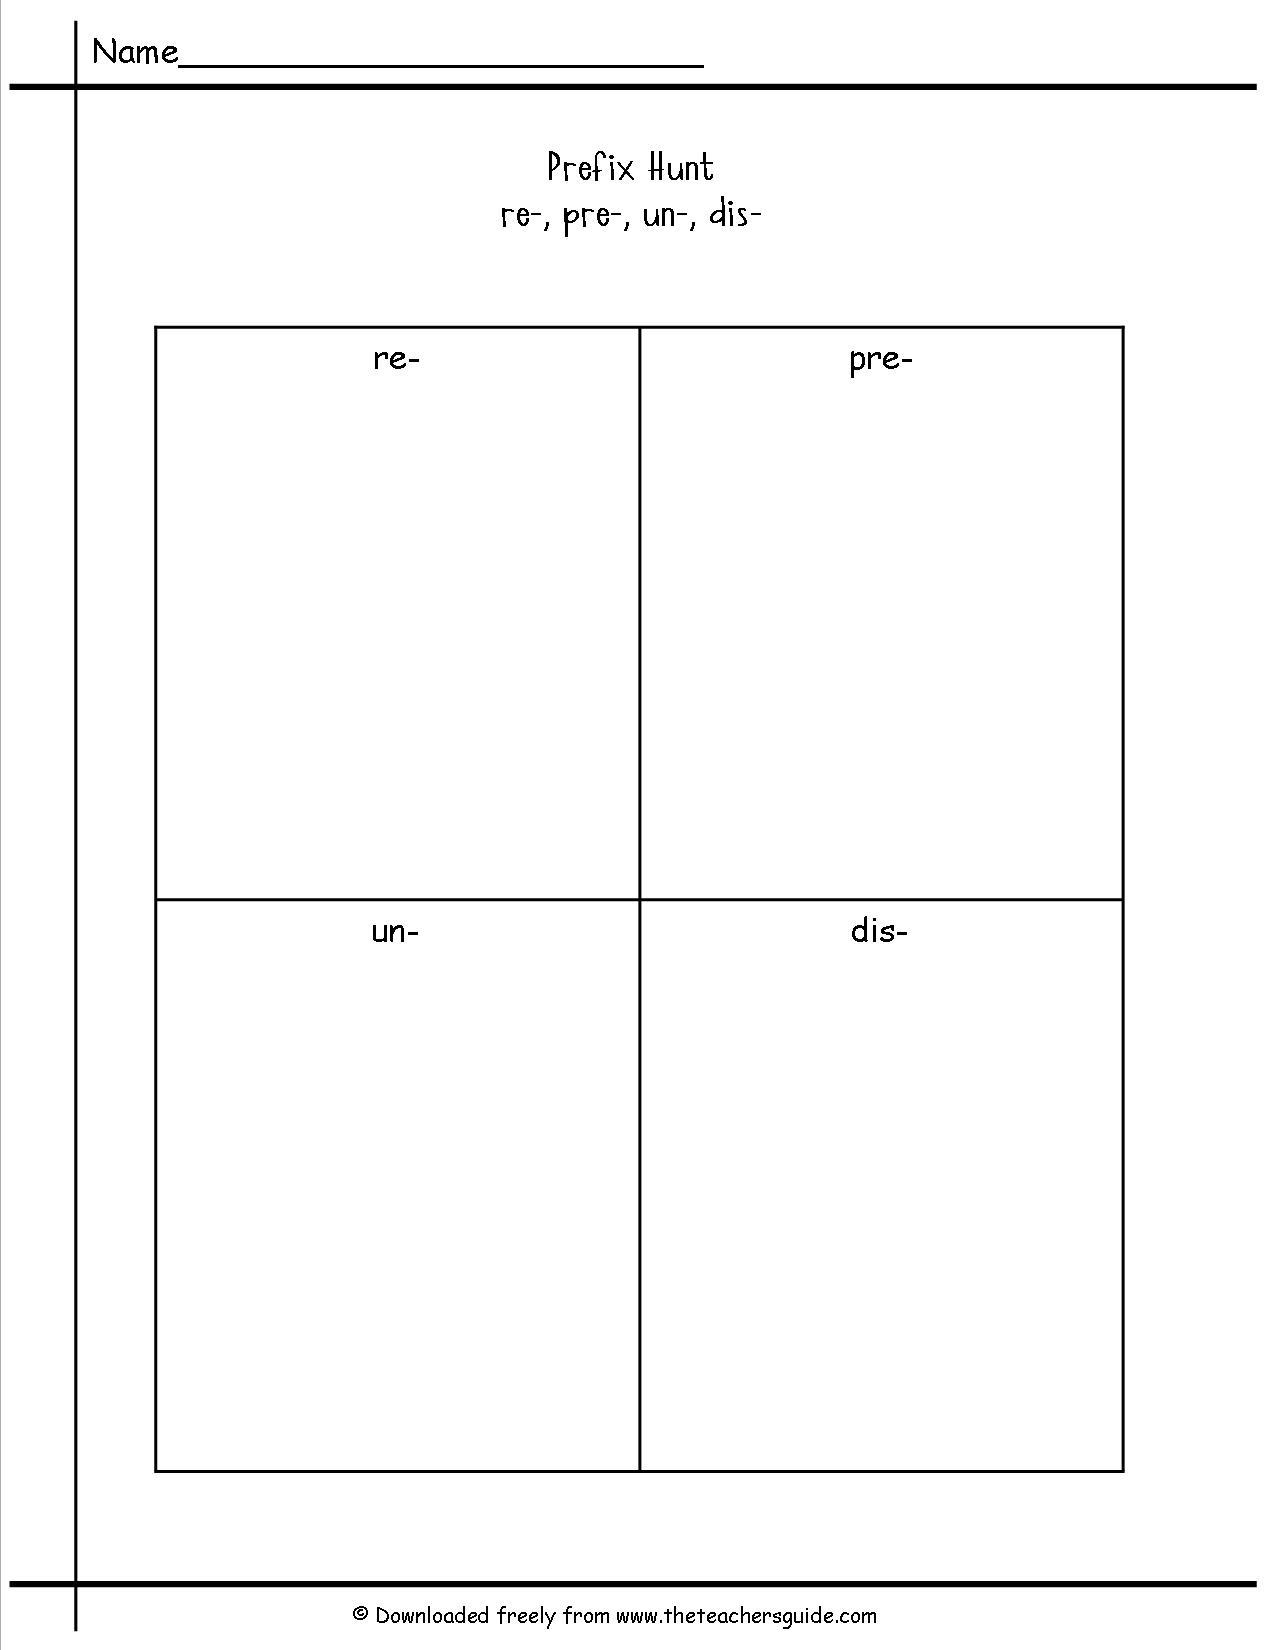 13 Best Images Of Prefix Suffix Worksheets